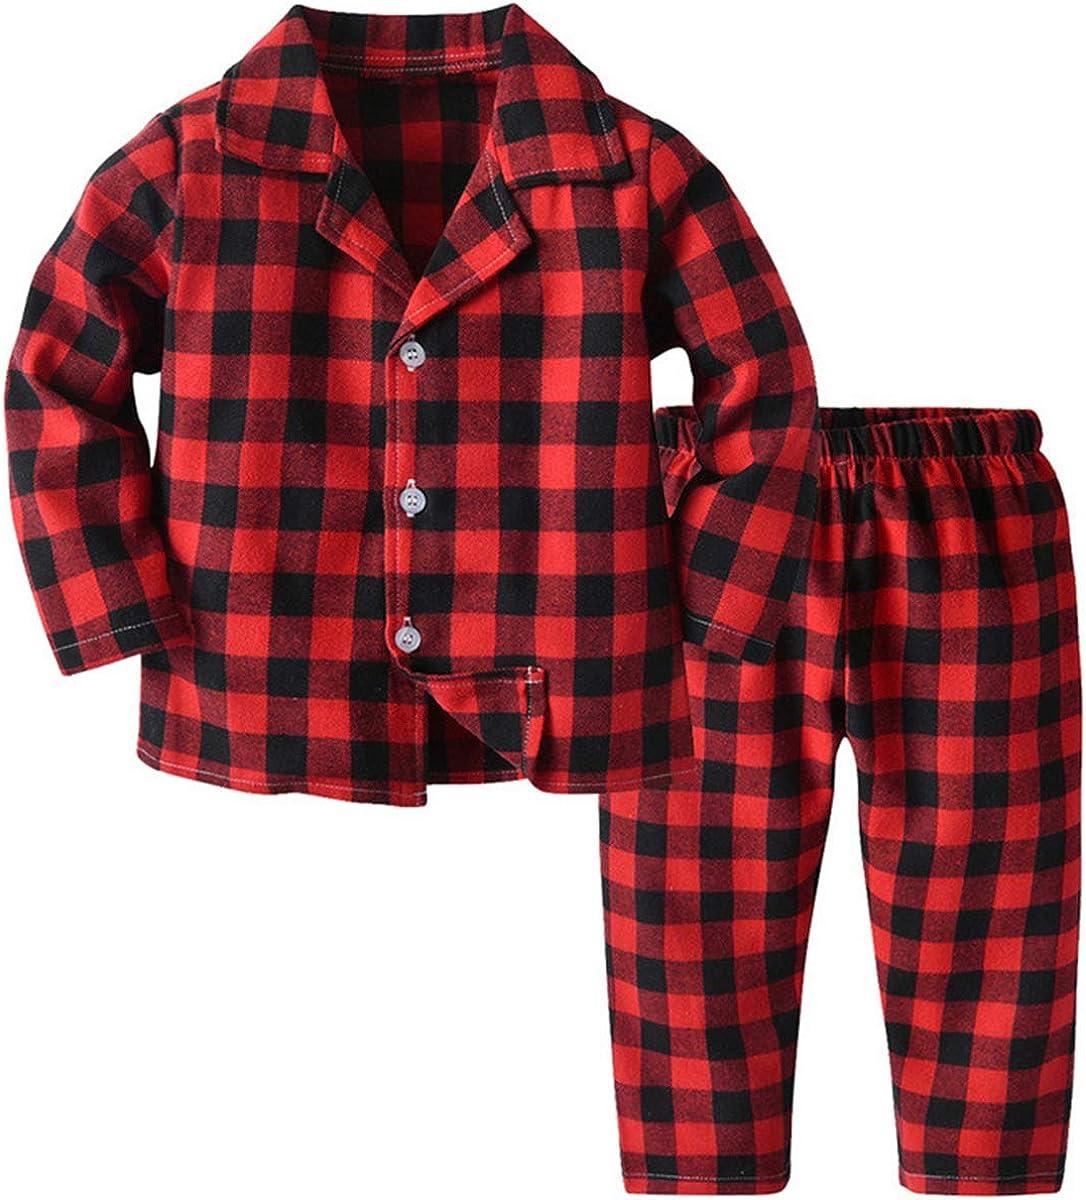 QZH.DUAO Kids Boy's Plaid Cotton Pajamas Set, Button Down Long and Short Sleepwear Pajamas Set, 6 Months - 10 Years